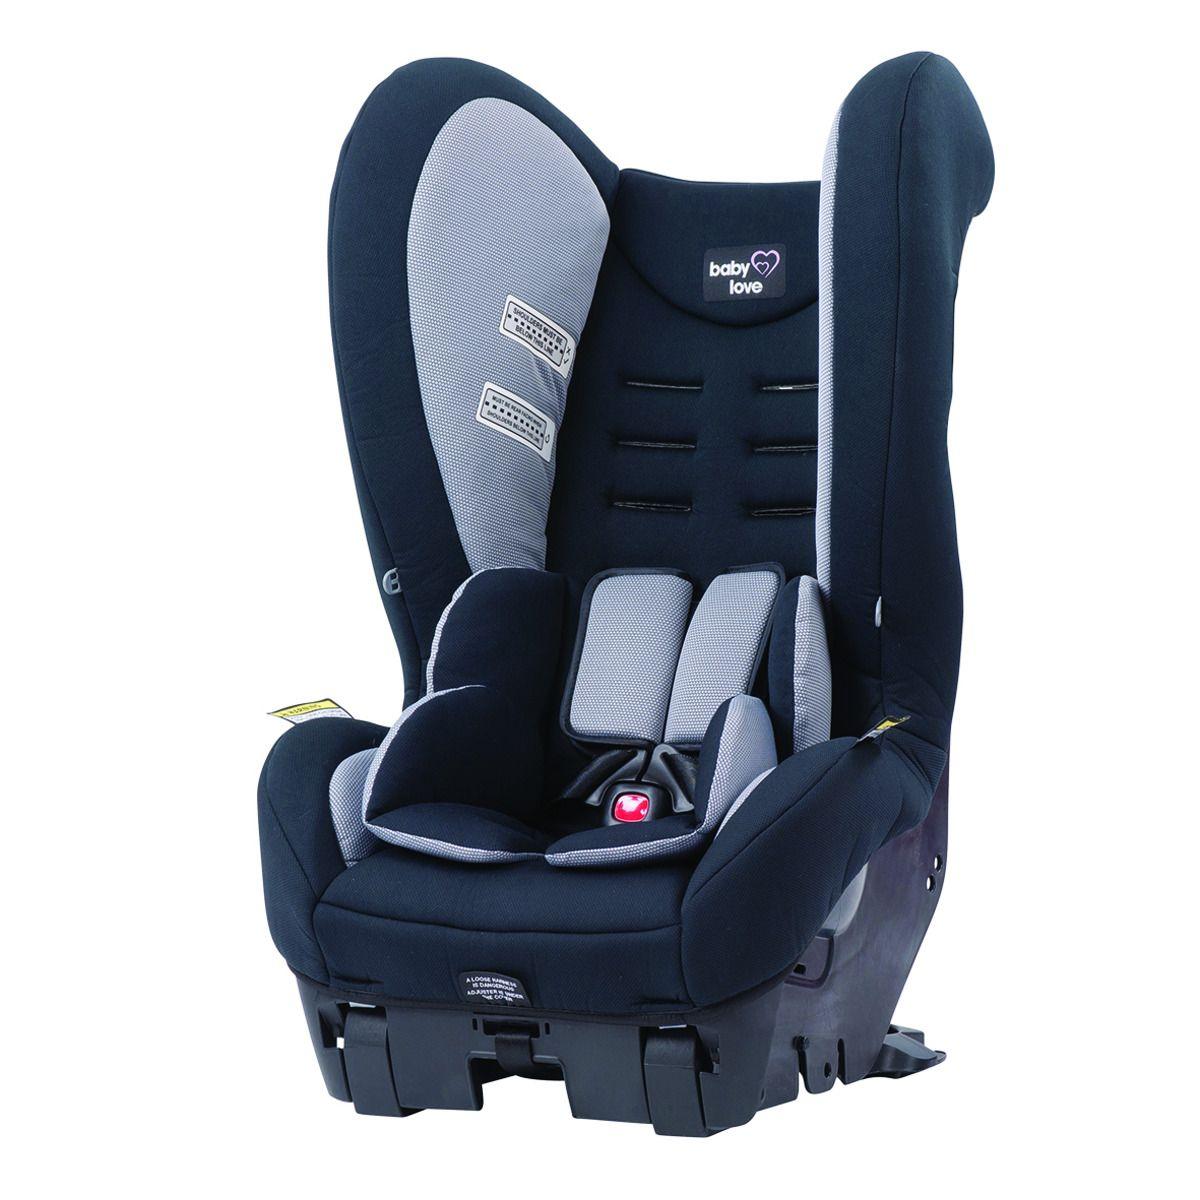 Babylove vantage ii convertible car seat car seats